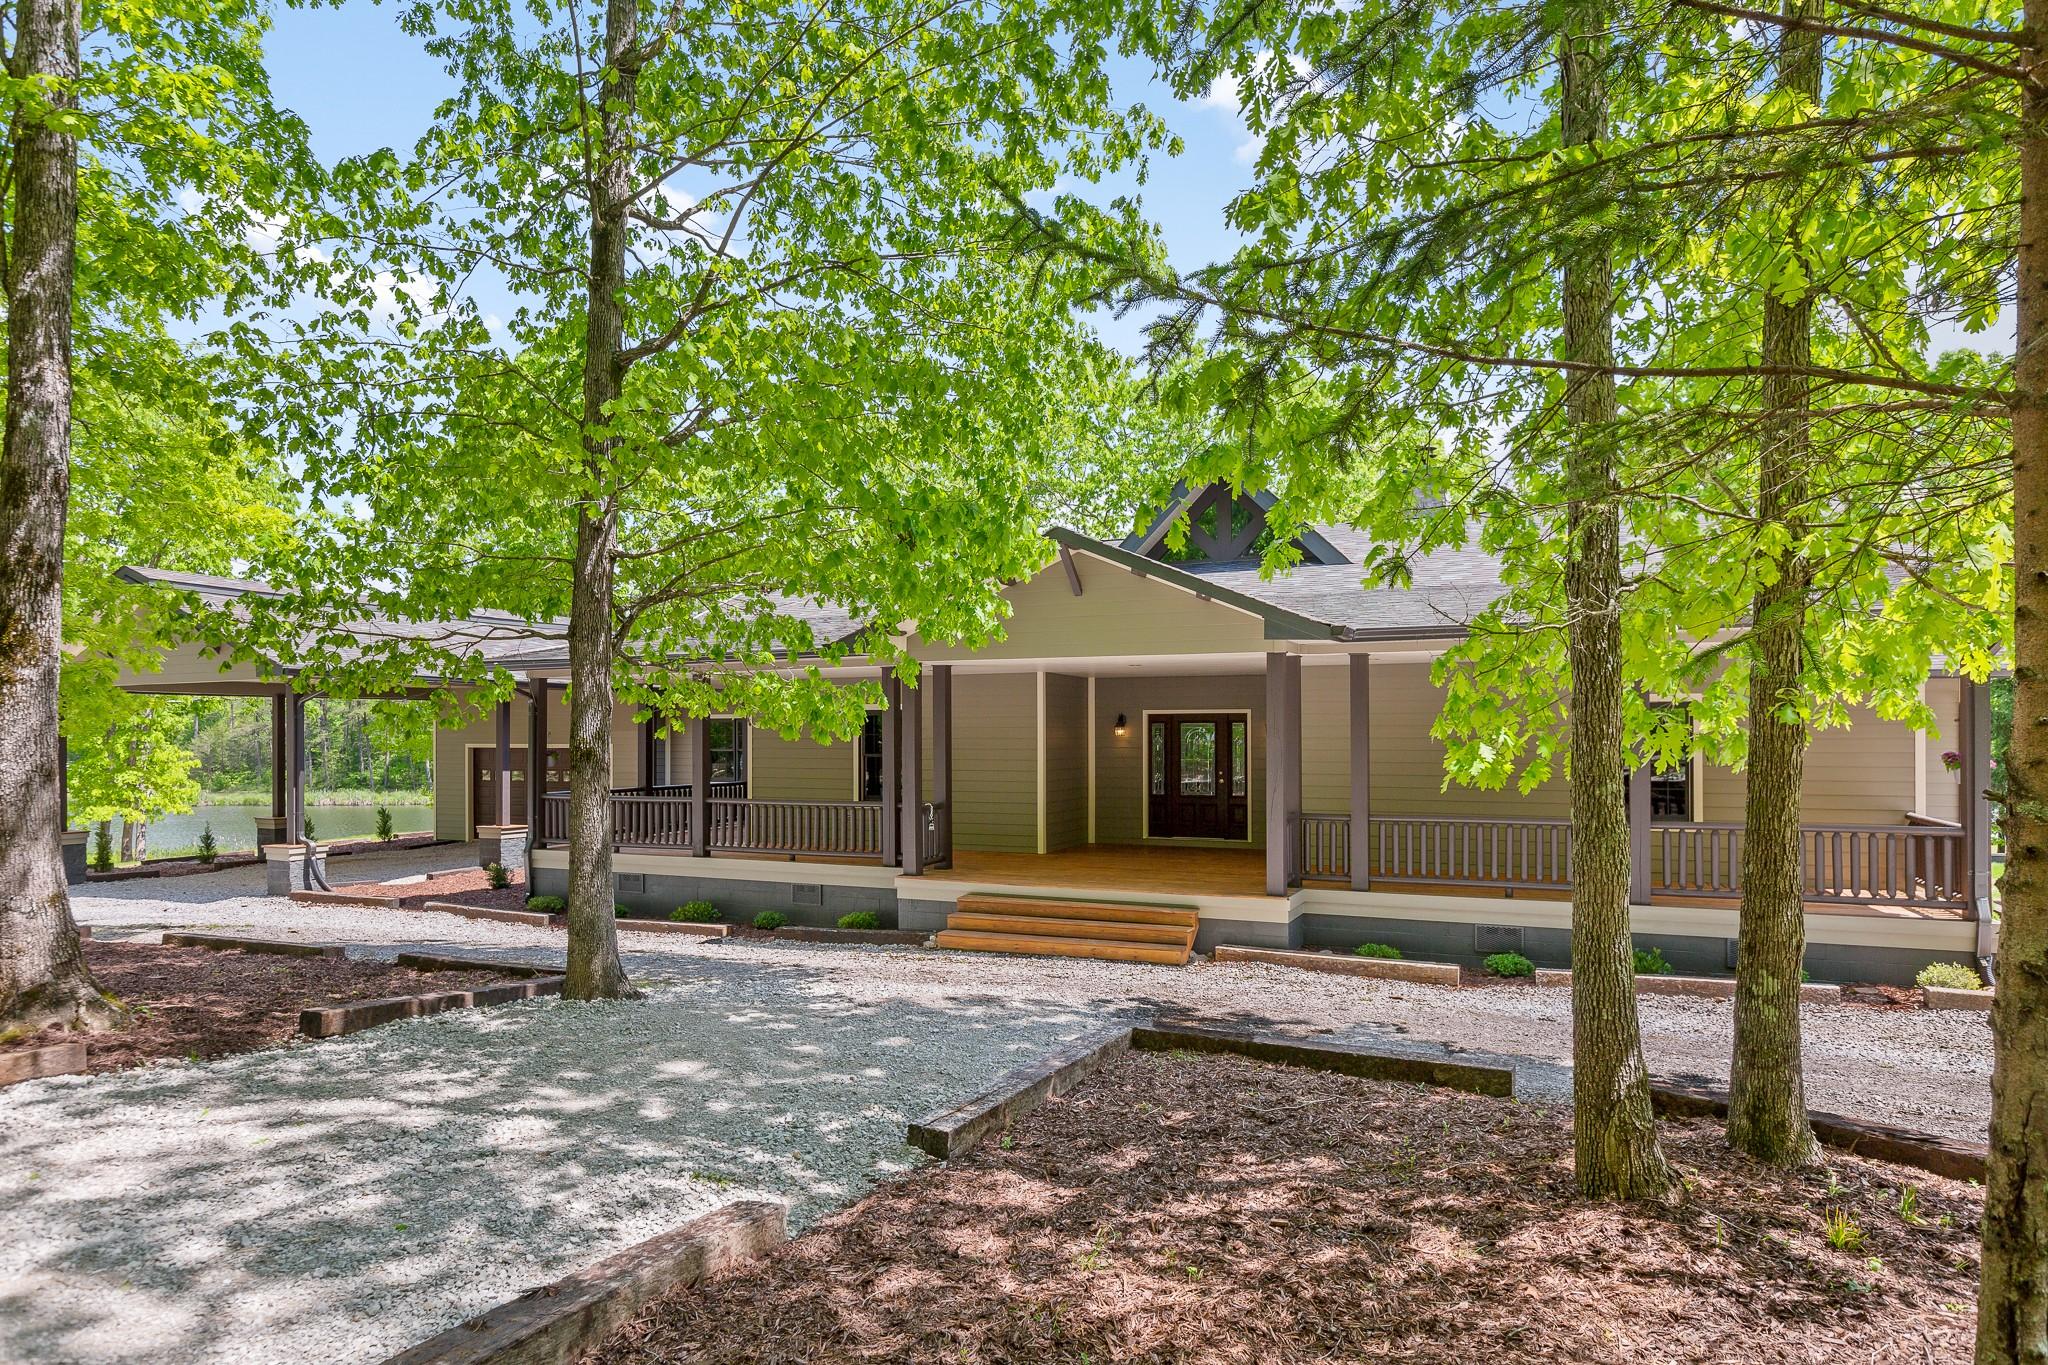 23571 SR 108 Property Photo - Coalmont, TN real estate listing